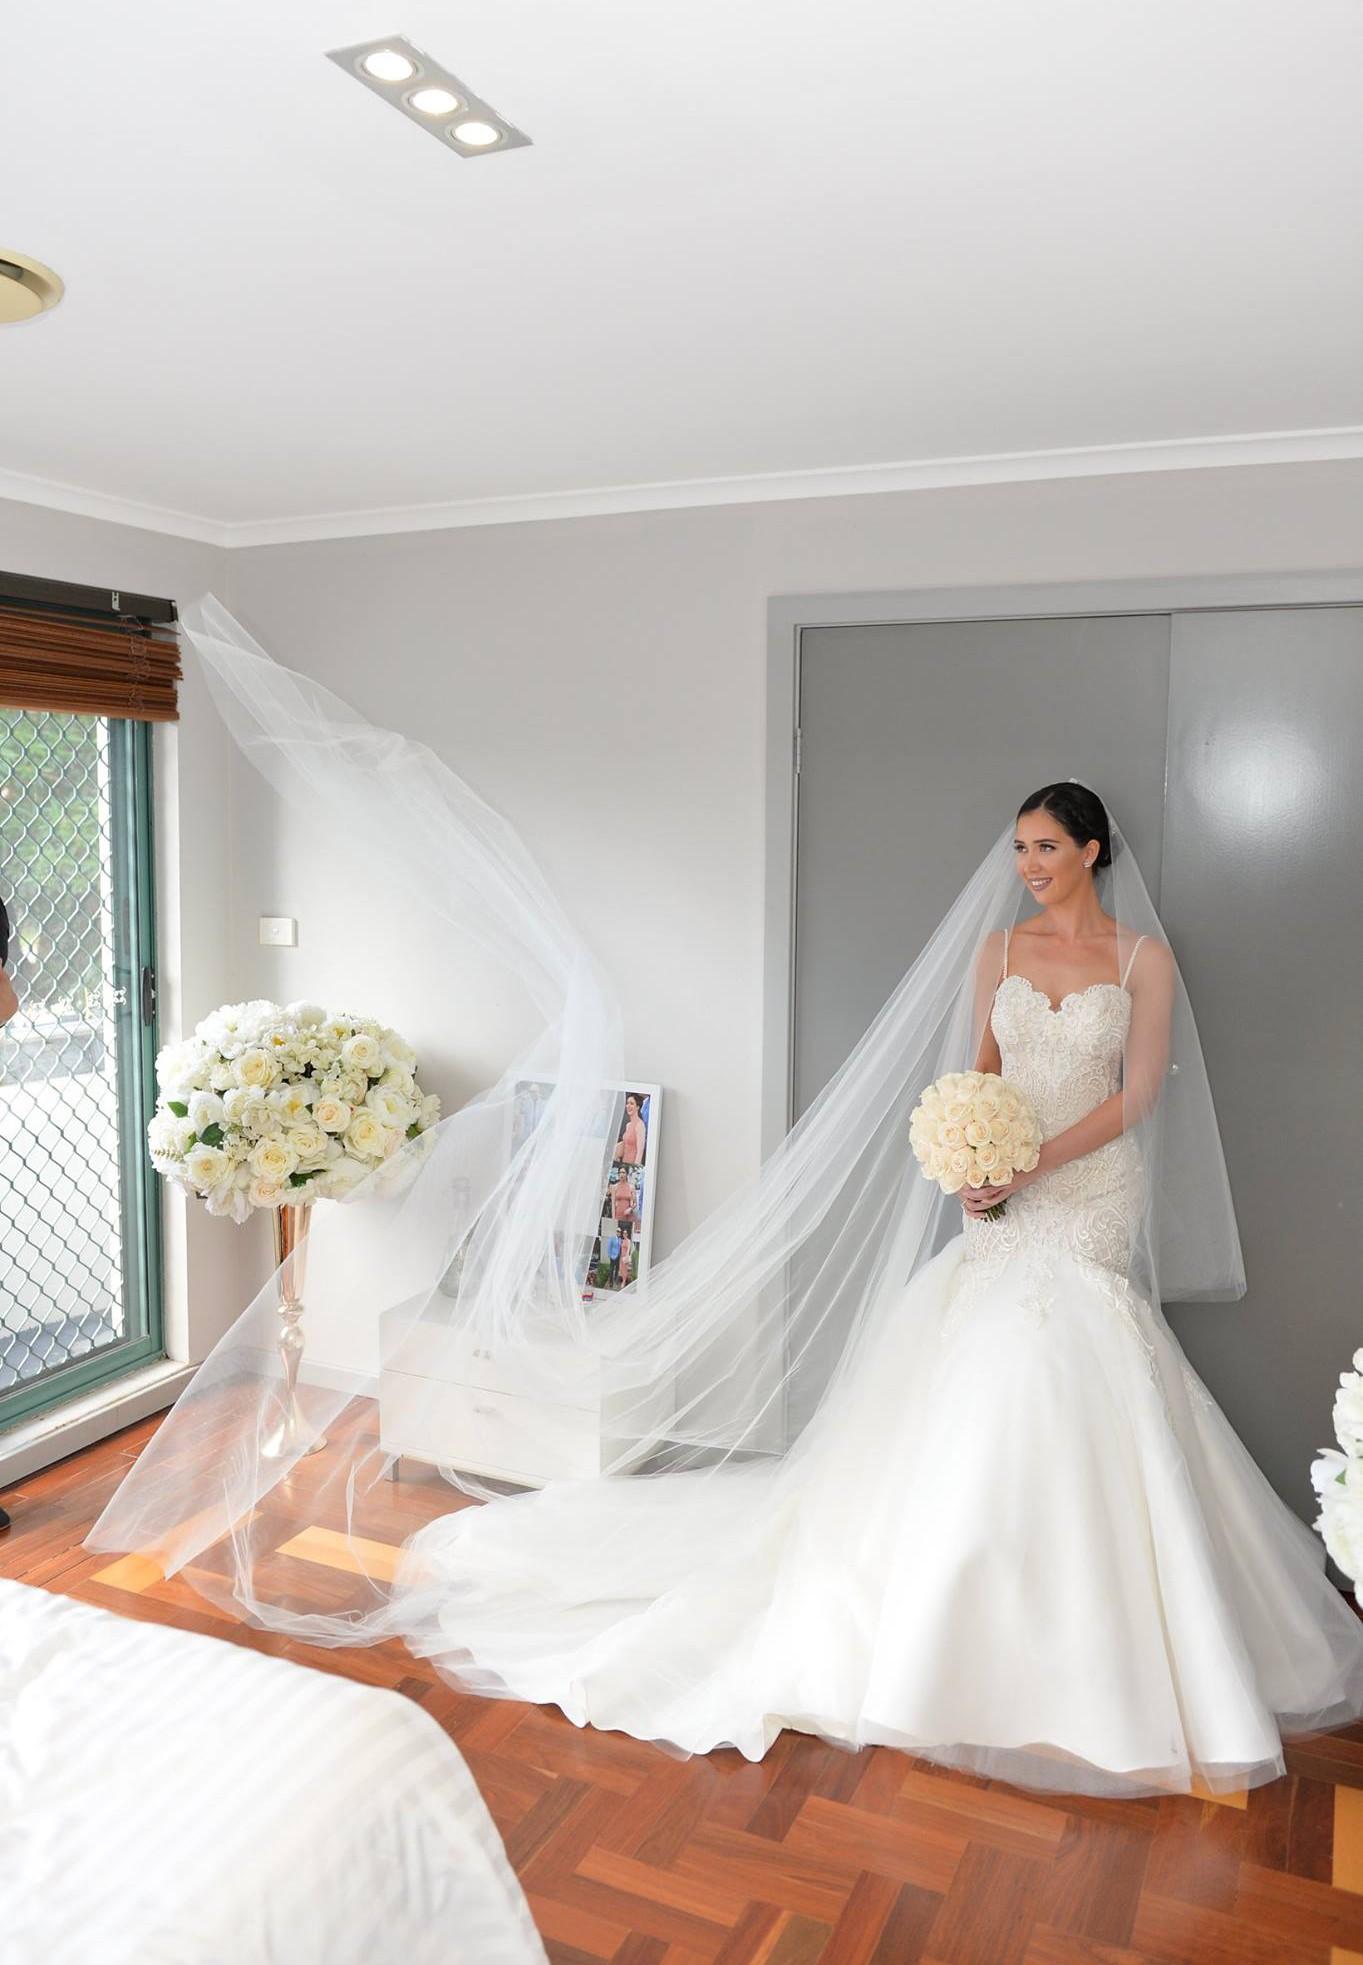 Suzanna blazevic preowned wedding dress on sale 80 off for Suzanna blazevic wedding dresses